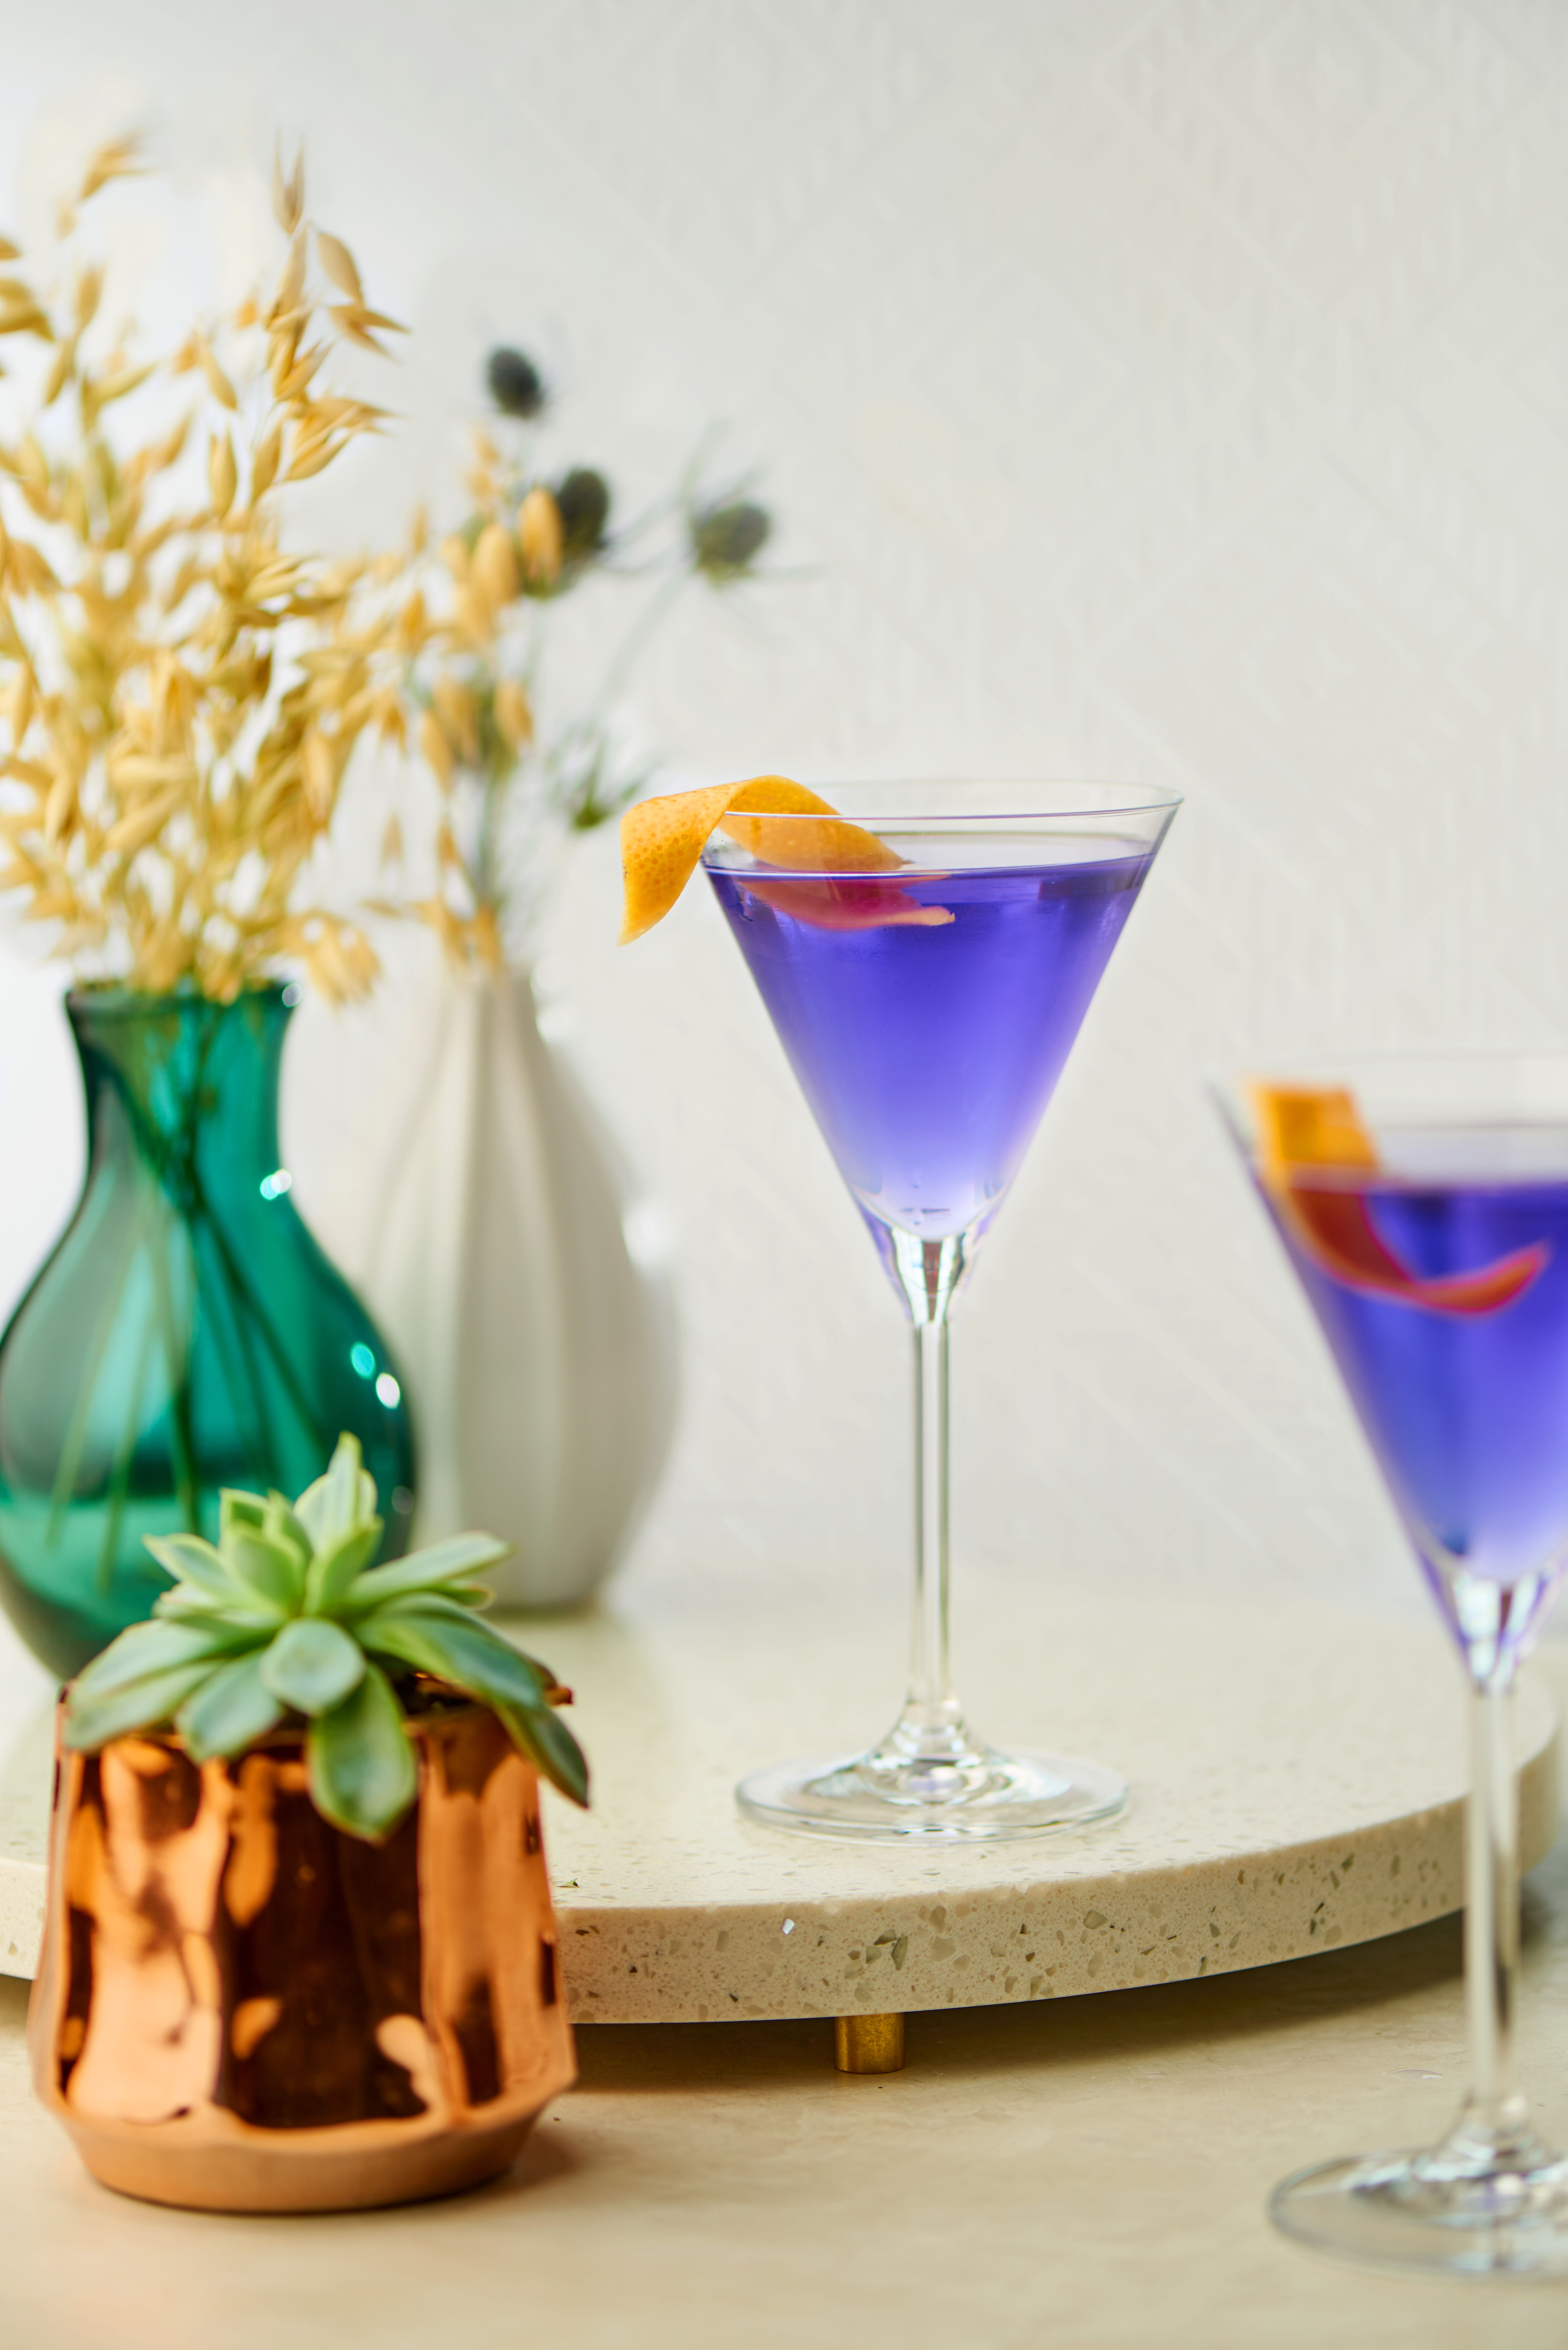 Empress martini gin cocktails gin cocktail recipes martini